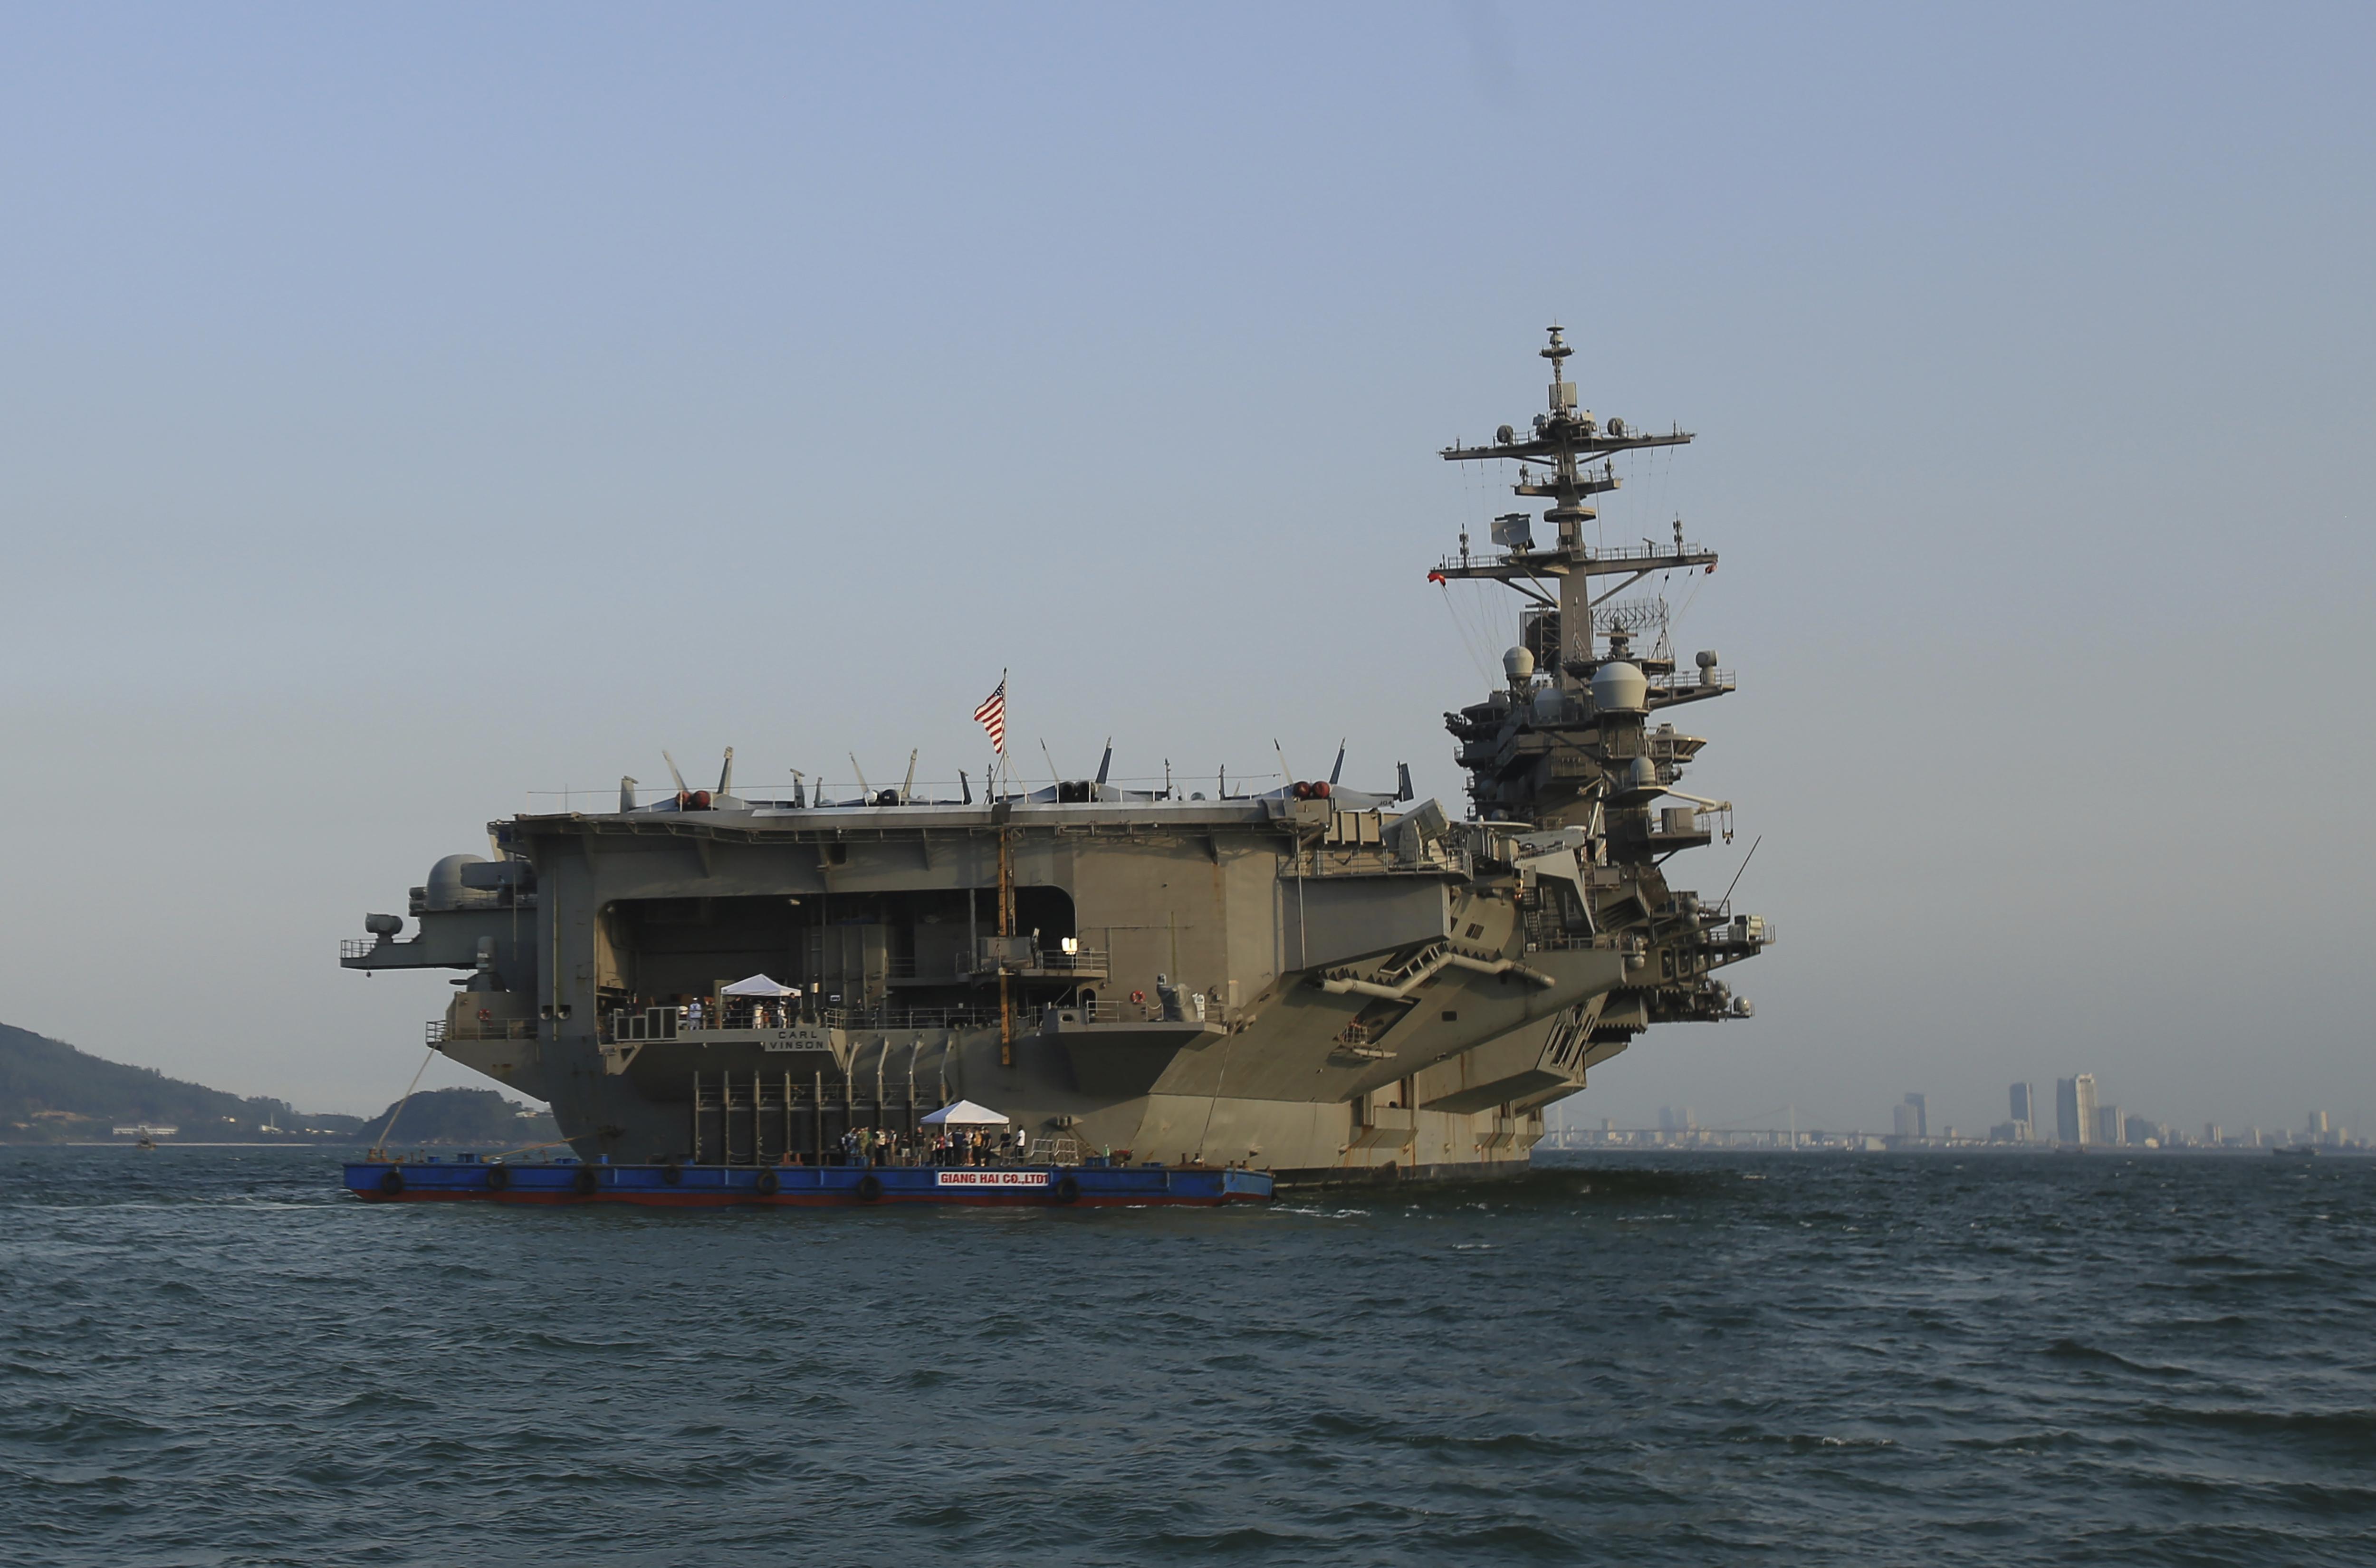 La portaerei USS Carl Vinson in visita nel Vietnam